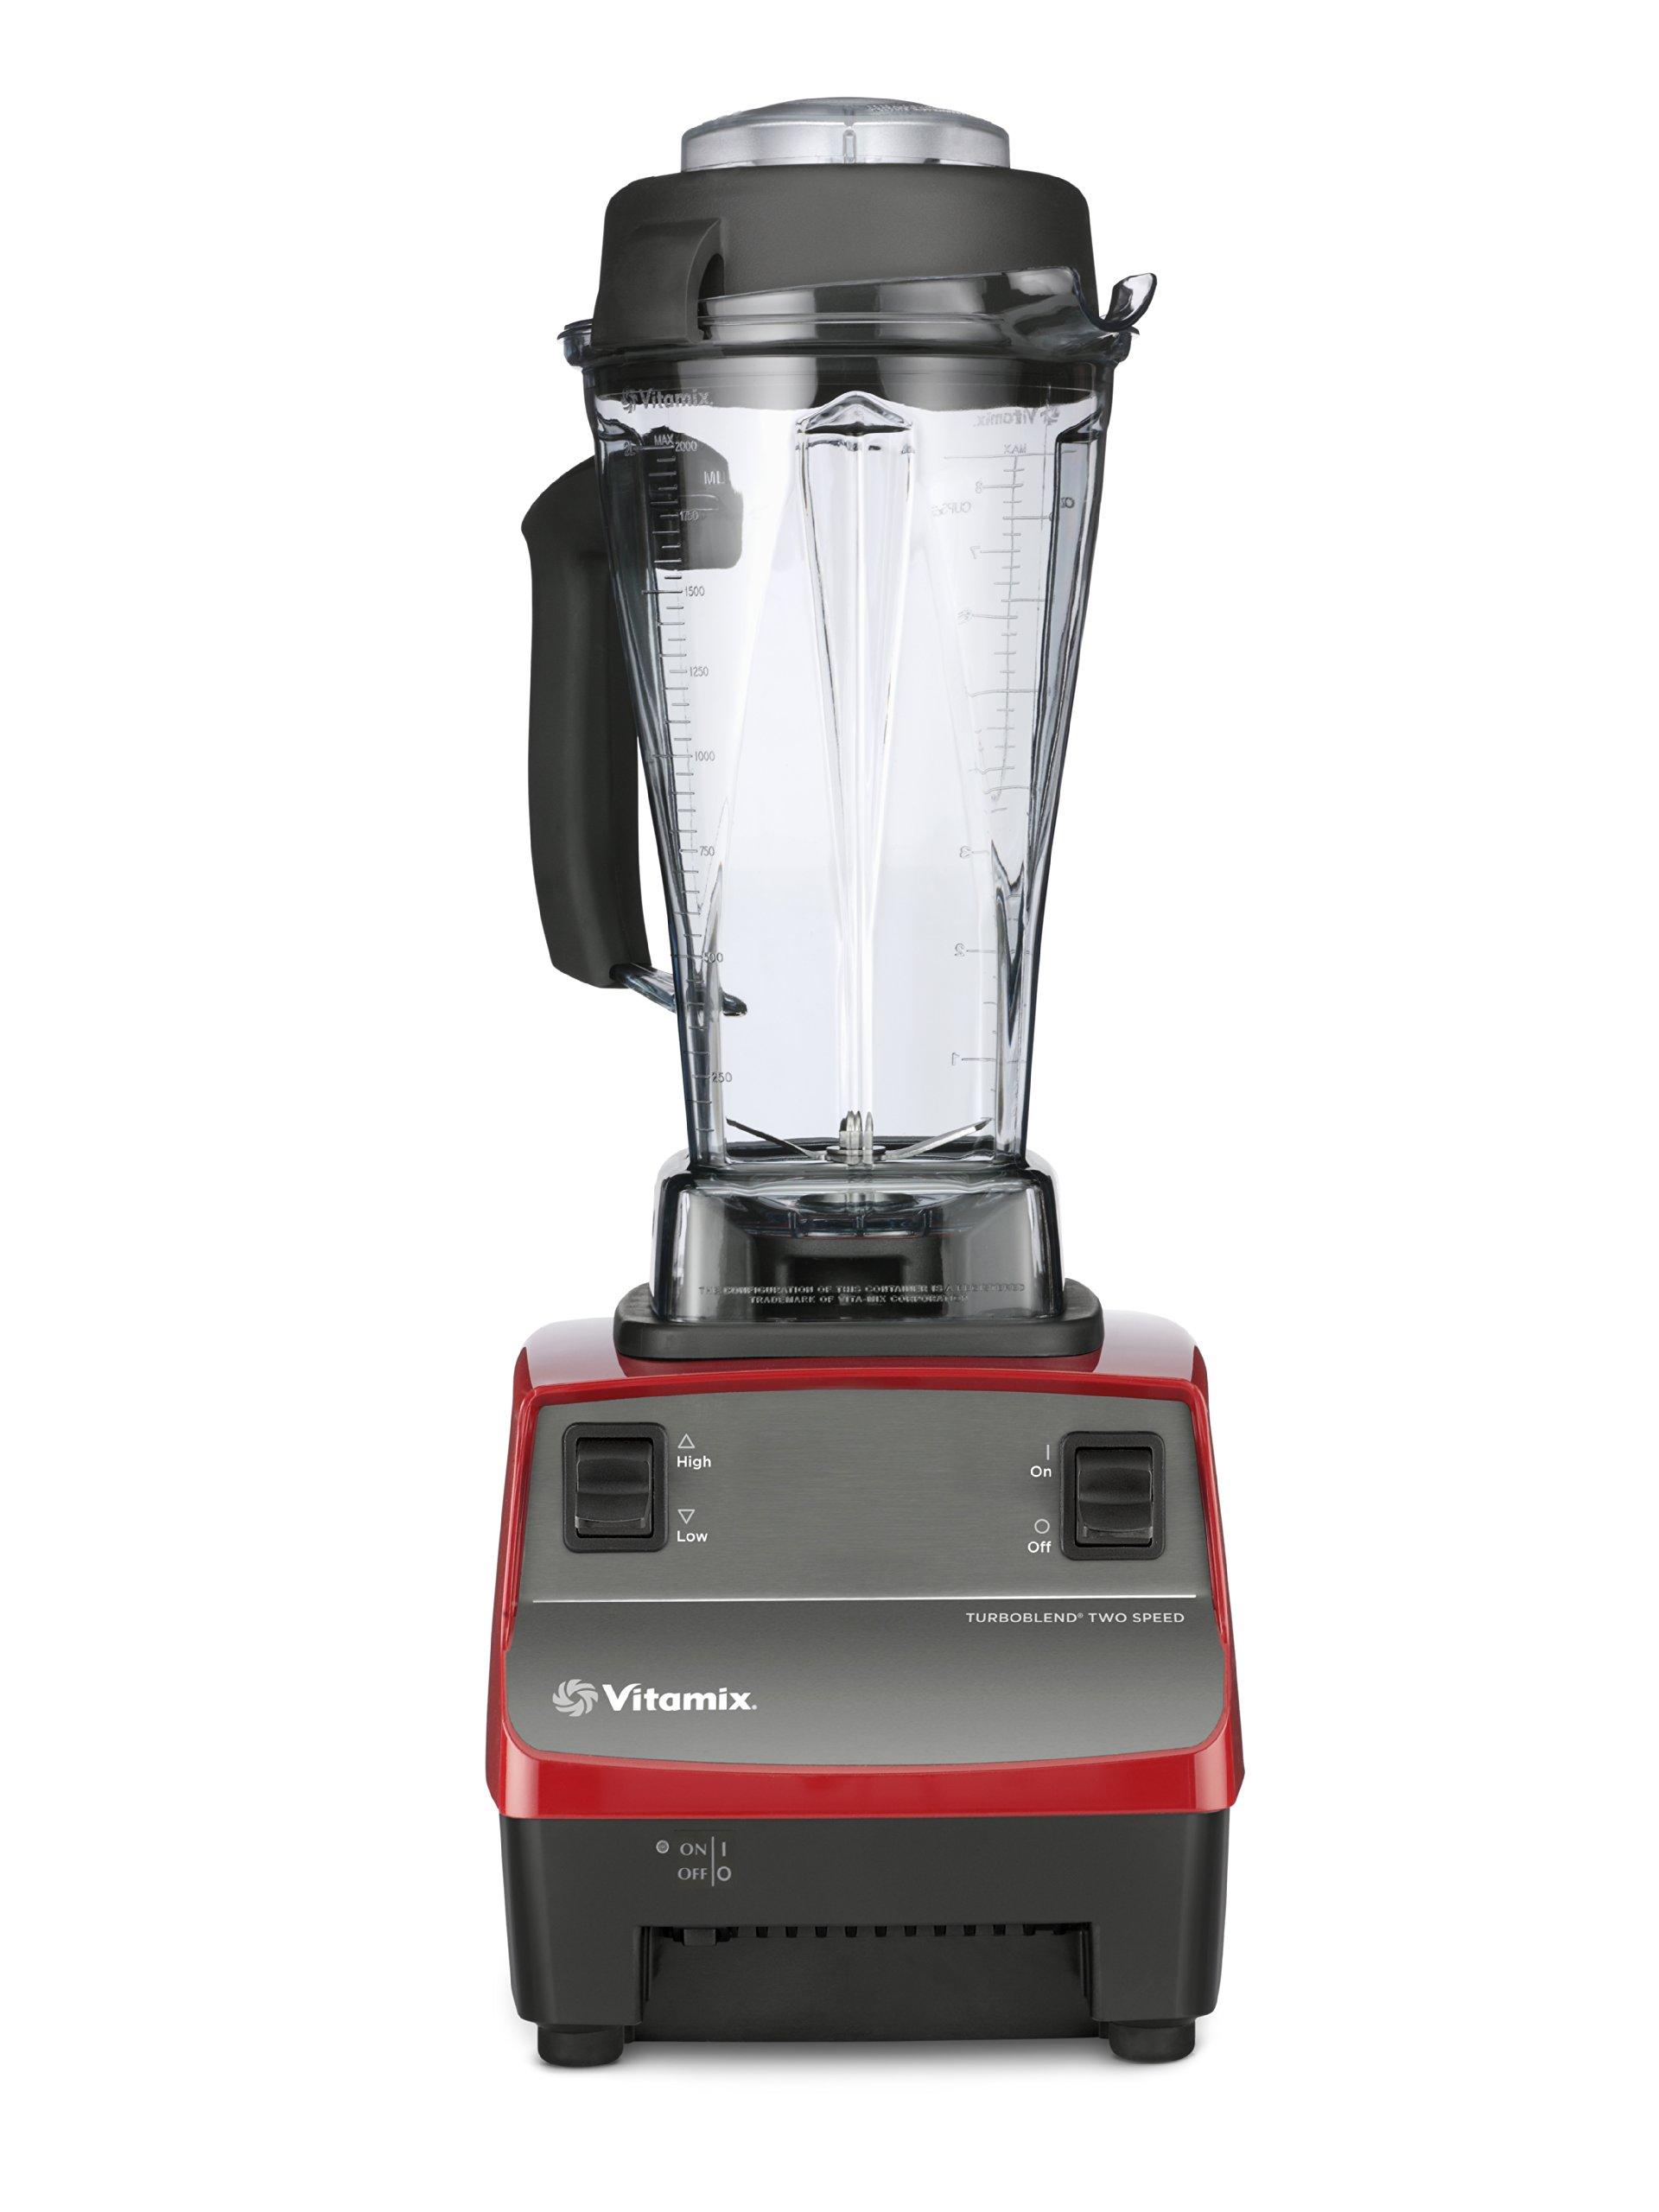 Vitamix Two Speed Blender, Red (Certified Refurbished)